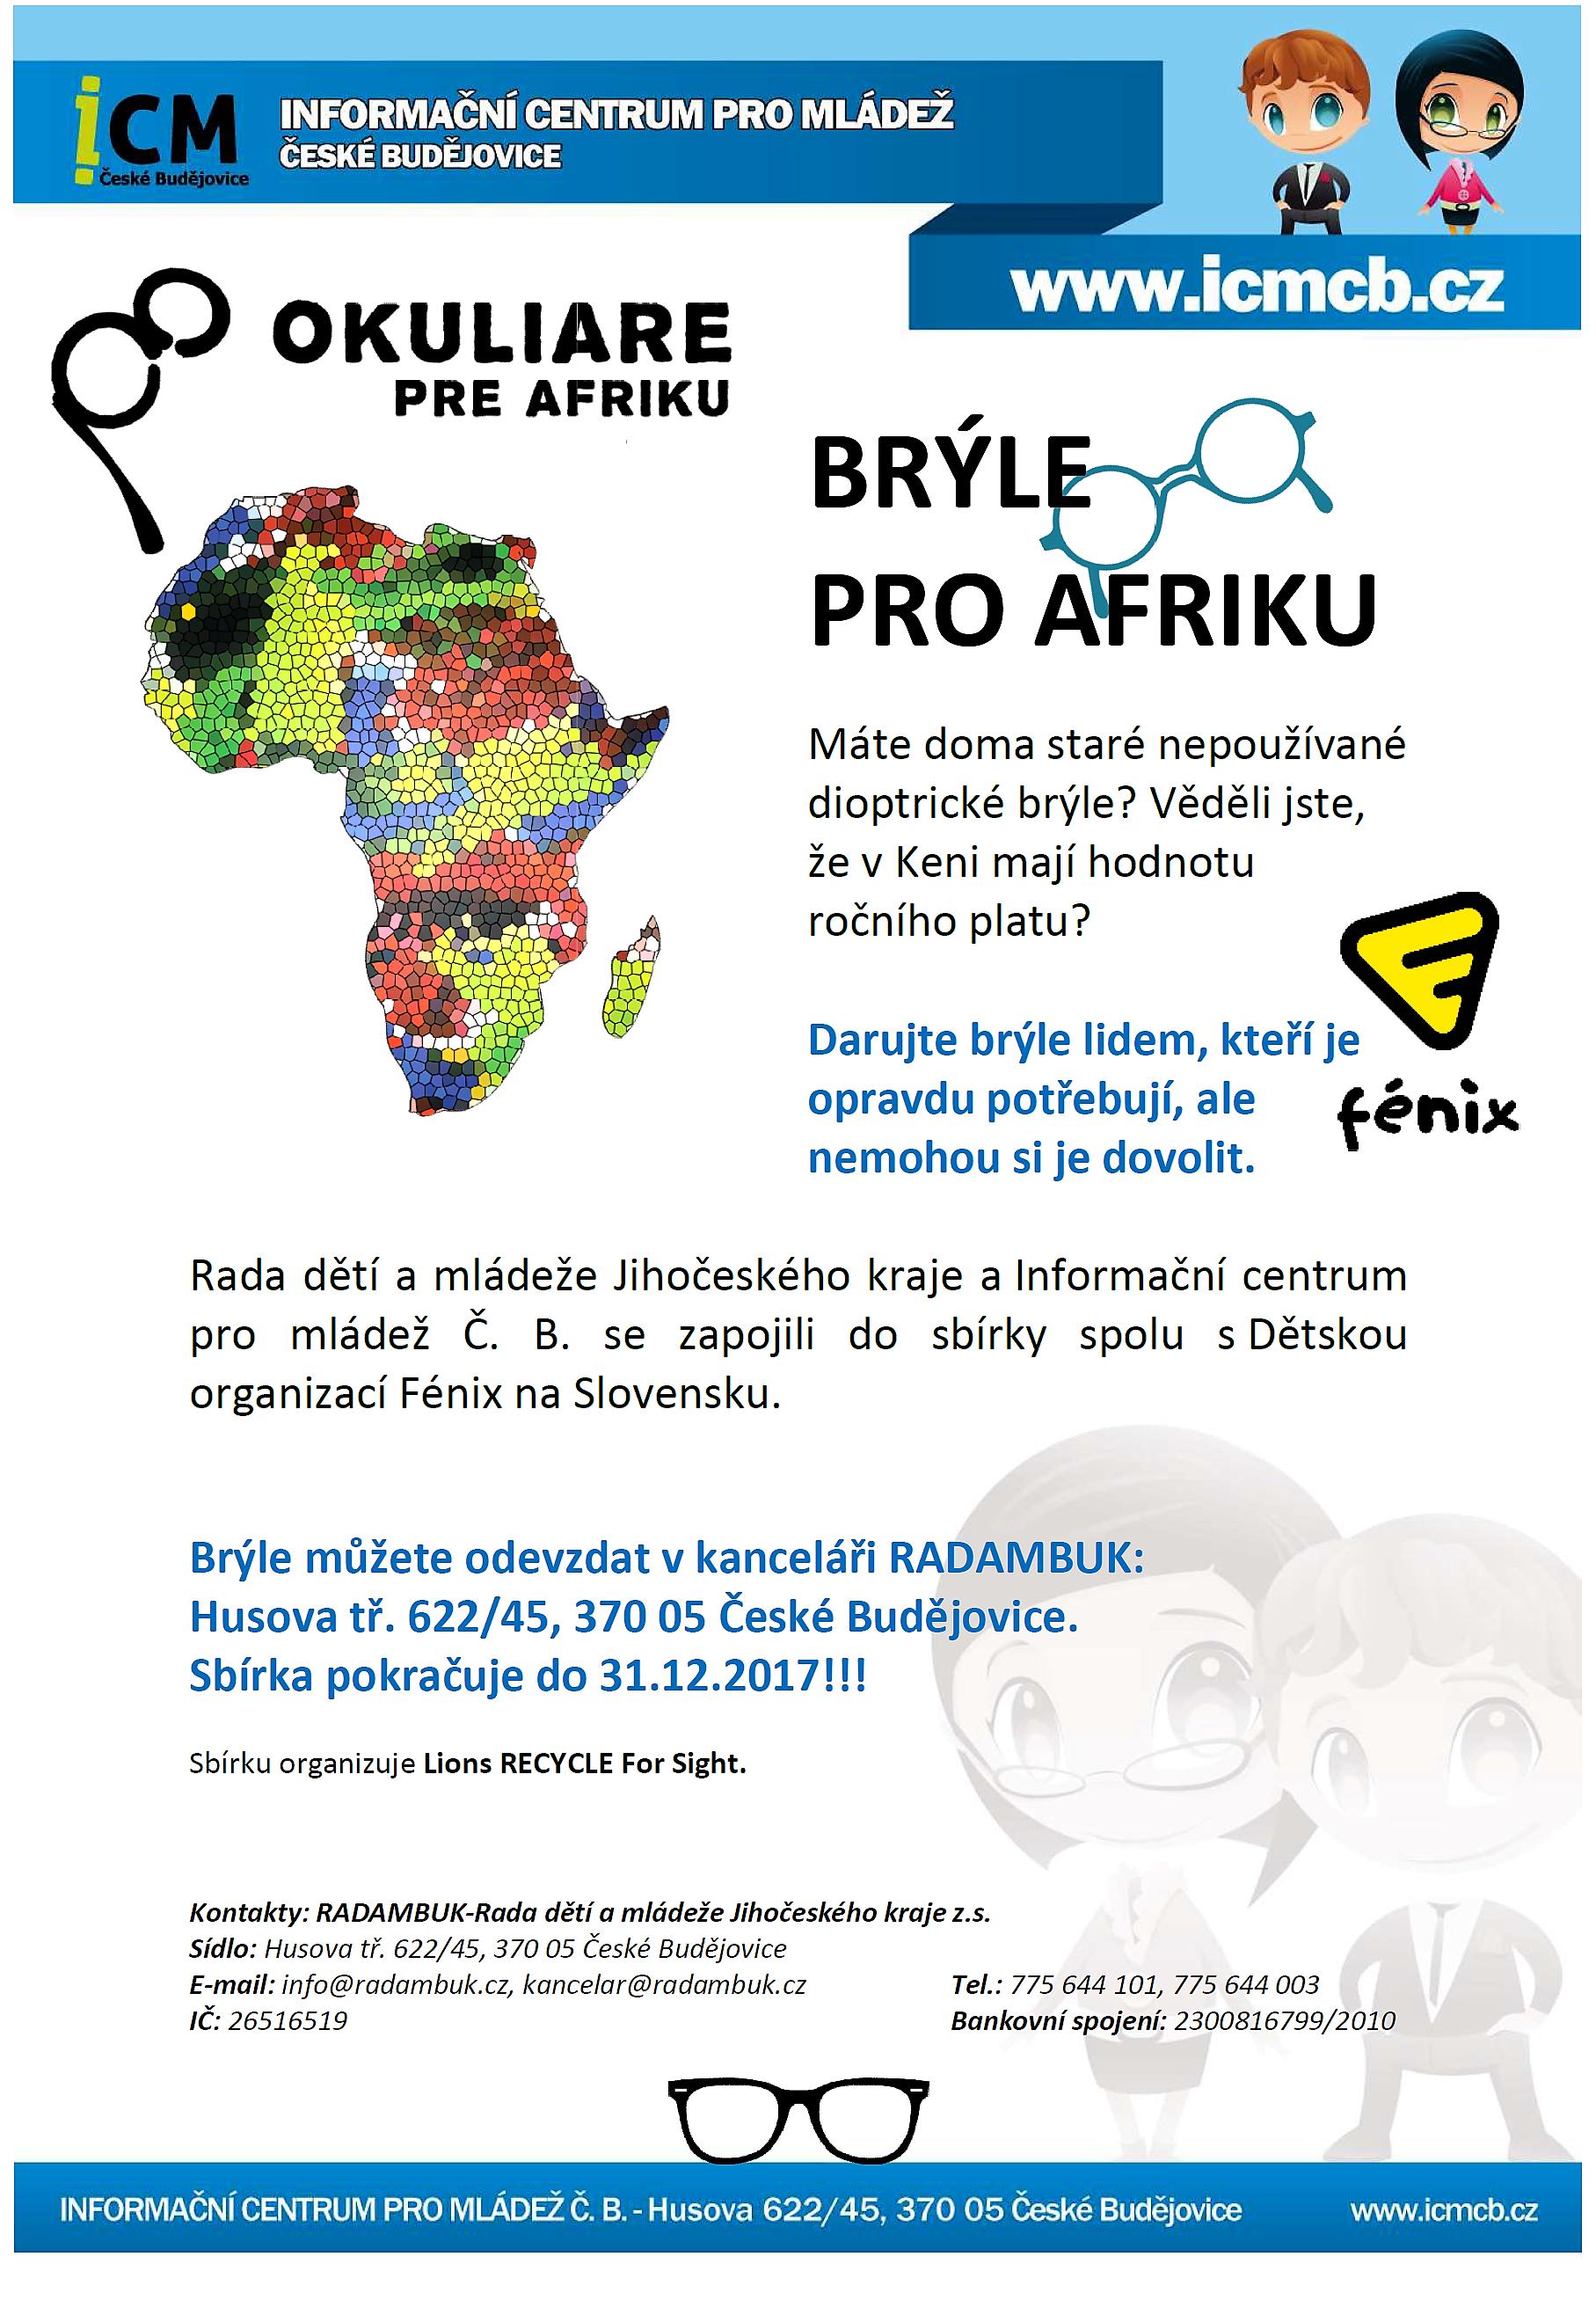 Brýle pro Afriku - ICM Č.B. 2017